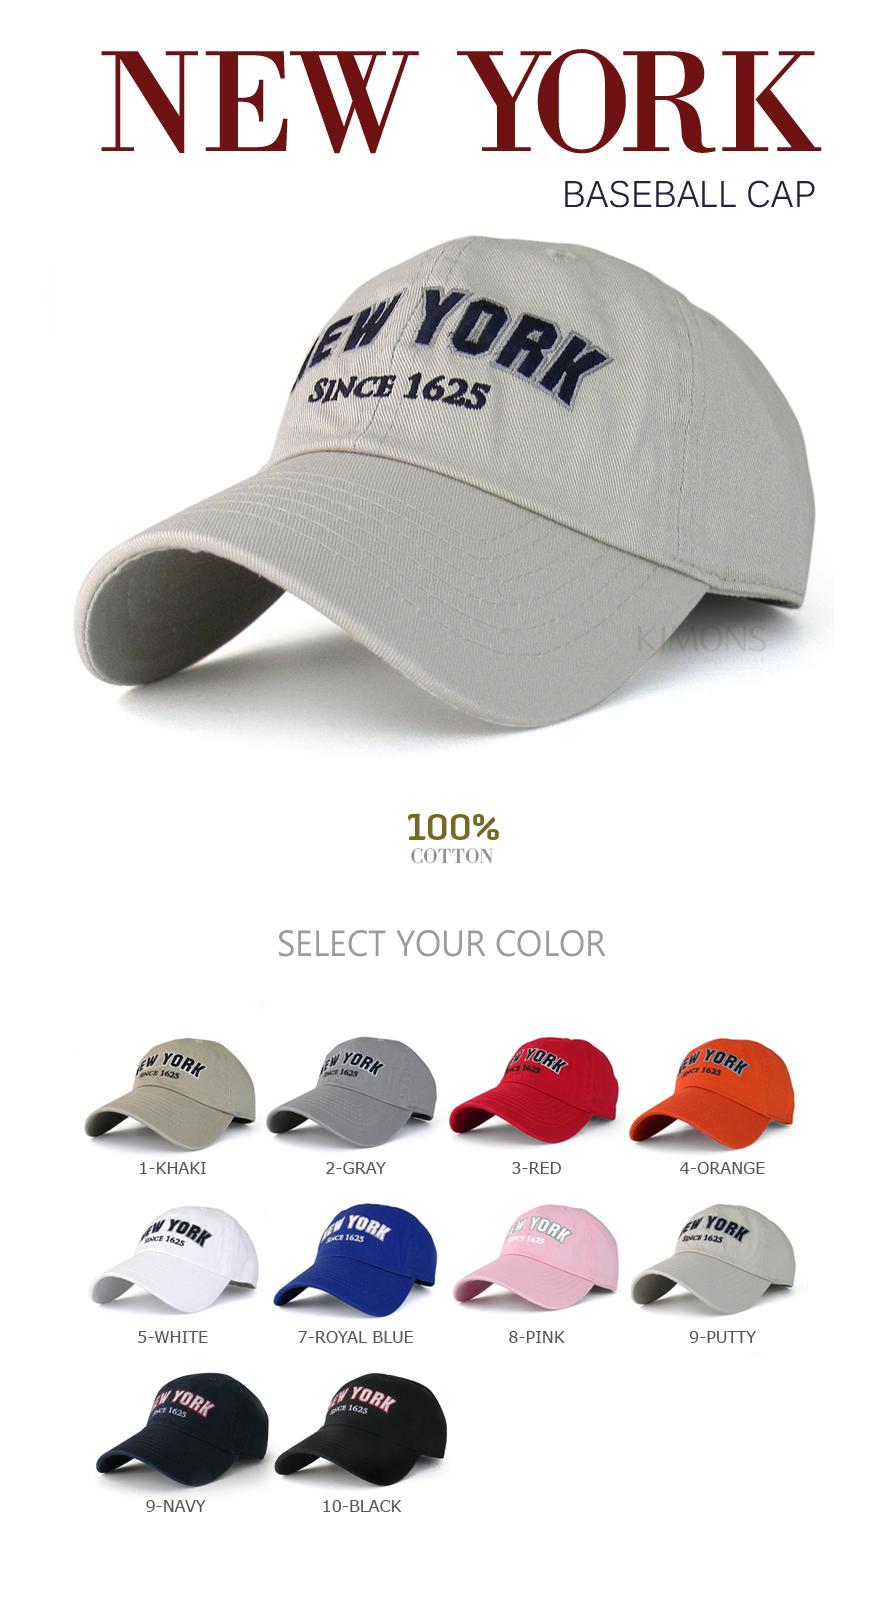 df02a7388de Ny Cap Hat - Saffron Indian Cuisine